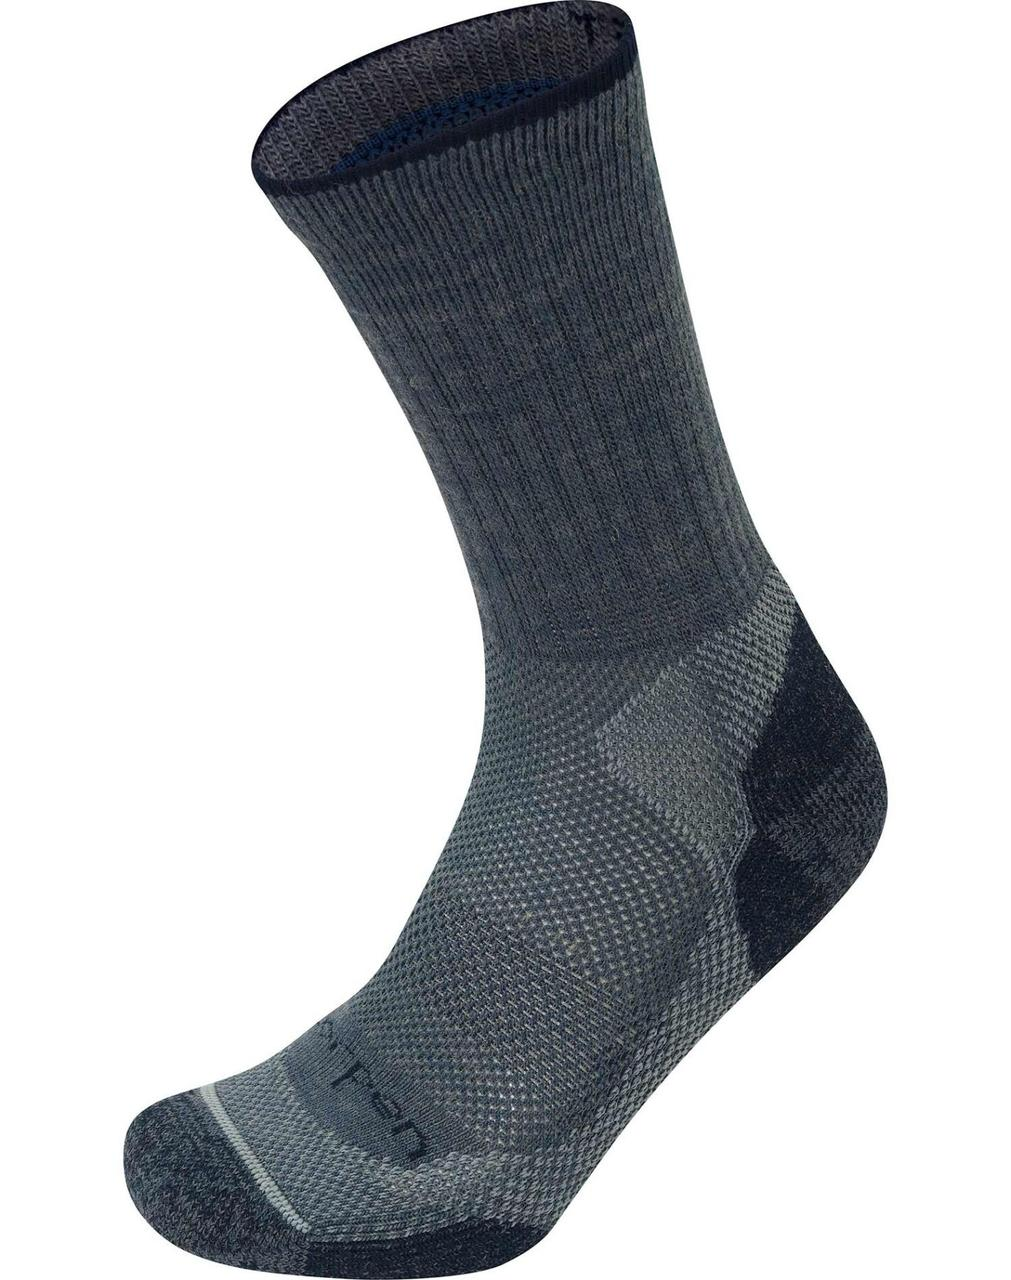 Носки Lorpen T2 Merino Hiker 2 Pack T2W Denim L (6610007 5419 L)